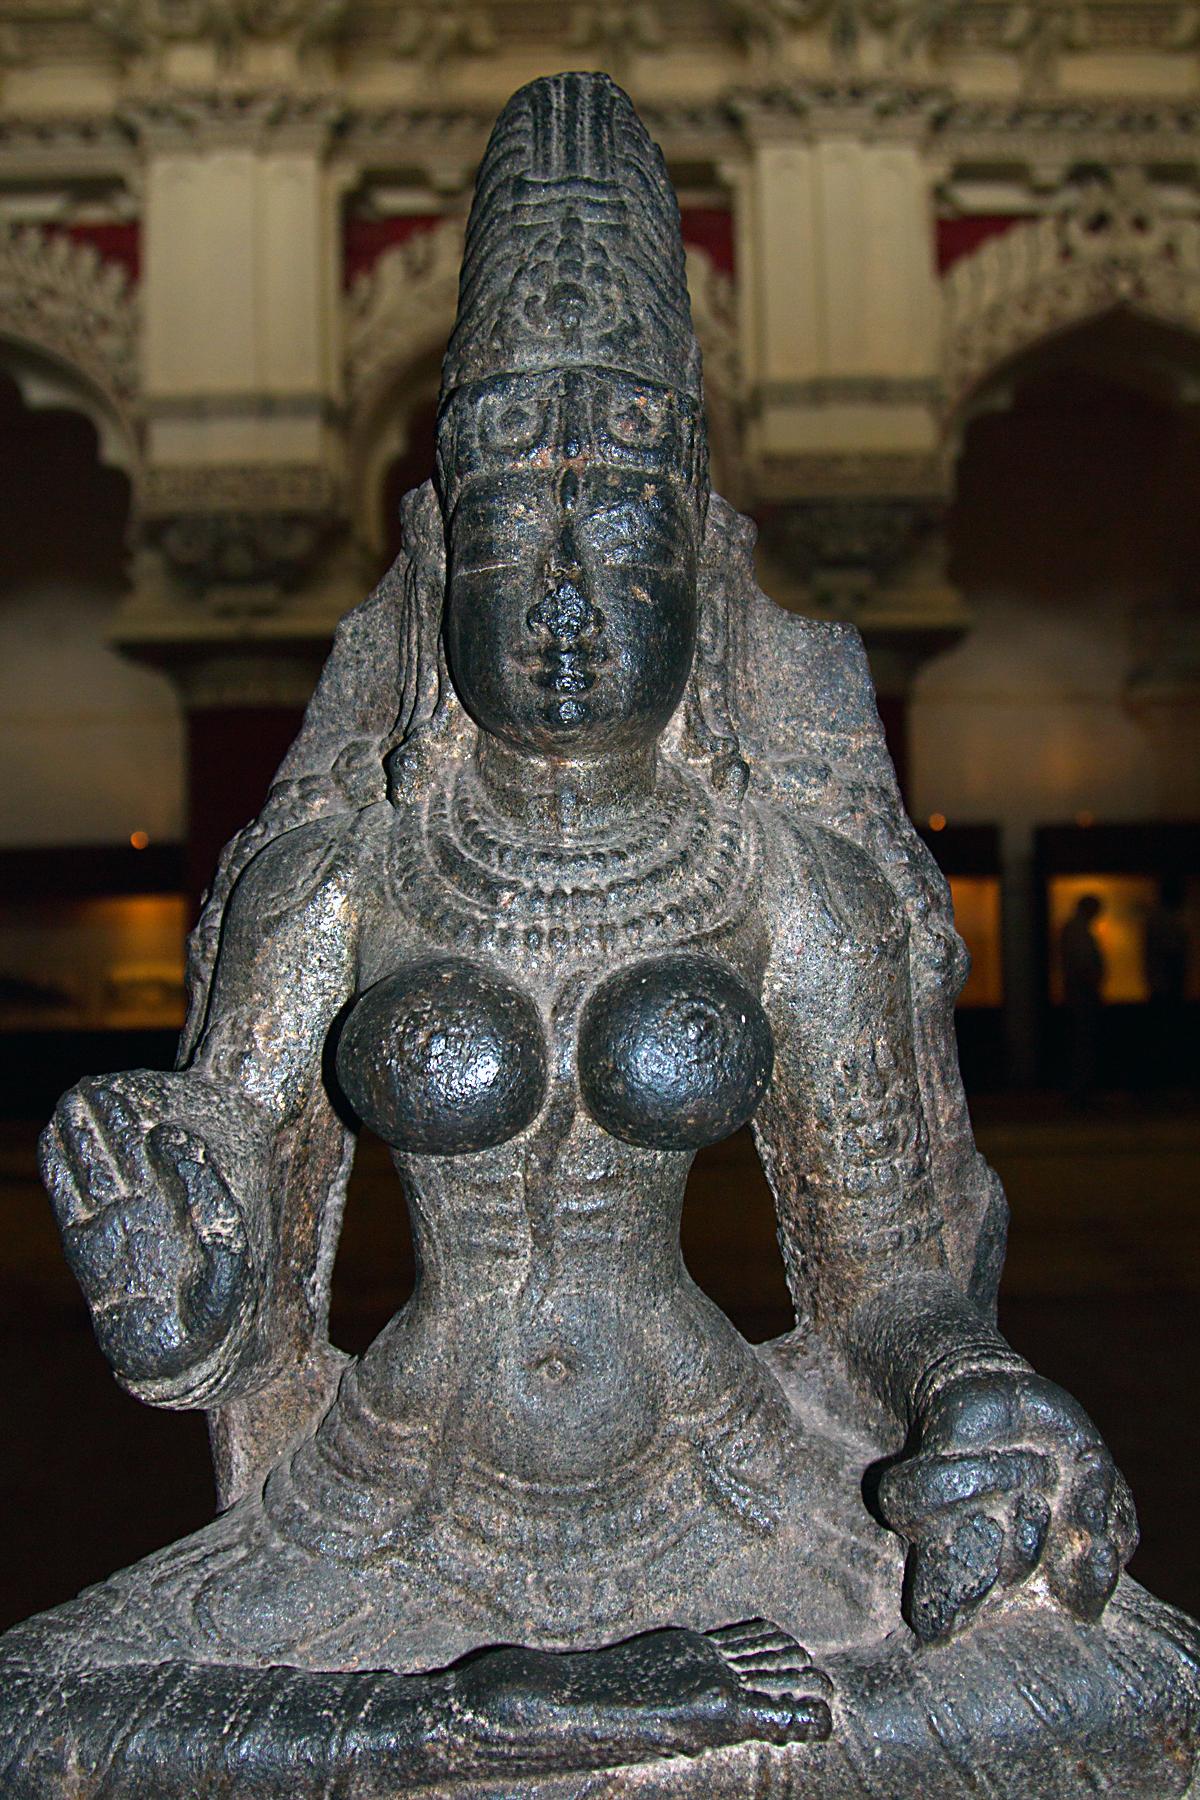 INDIEN Chennai Kanchipuram Tempel Menschen Tempel FINEST-onTour 7741.jpg